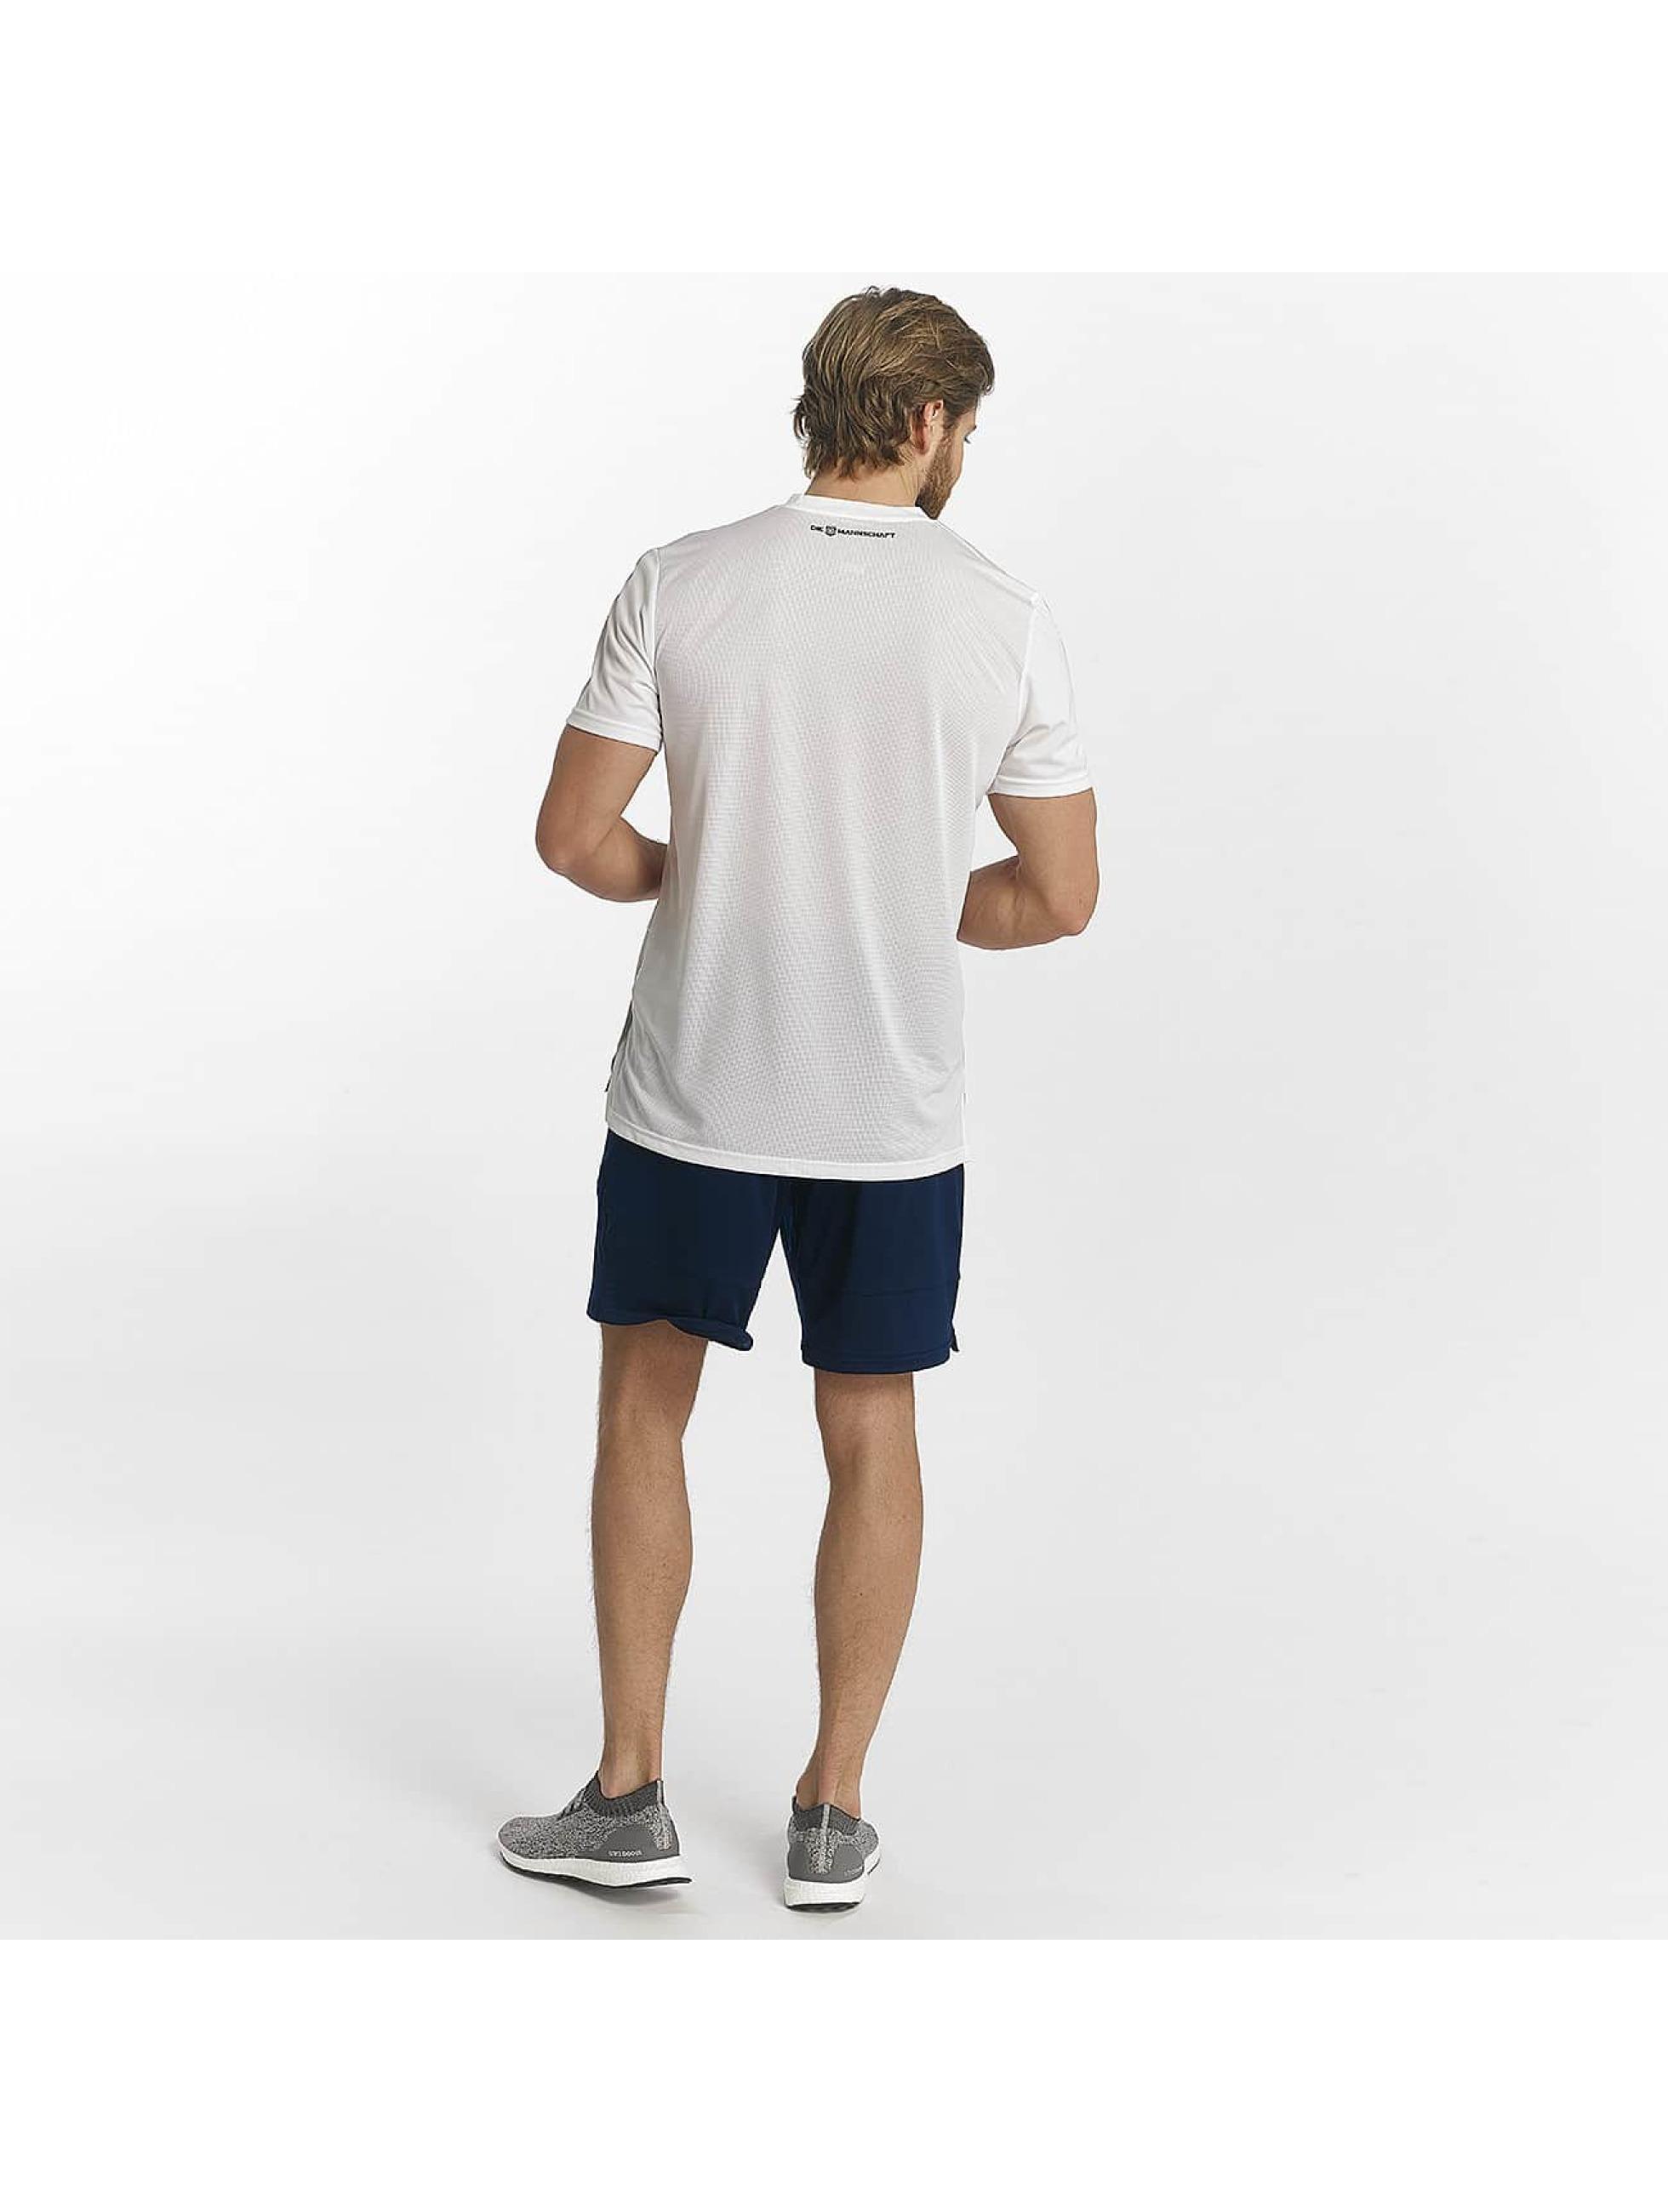 adidas Performance Trikot DFB Training Trikot hvit